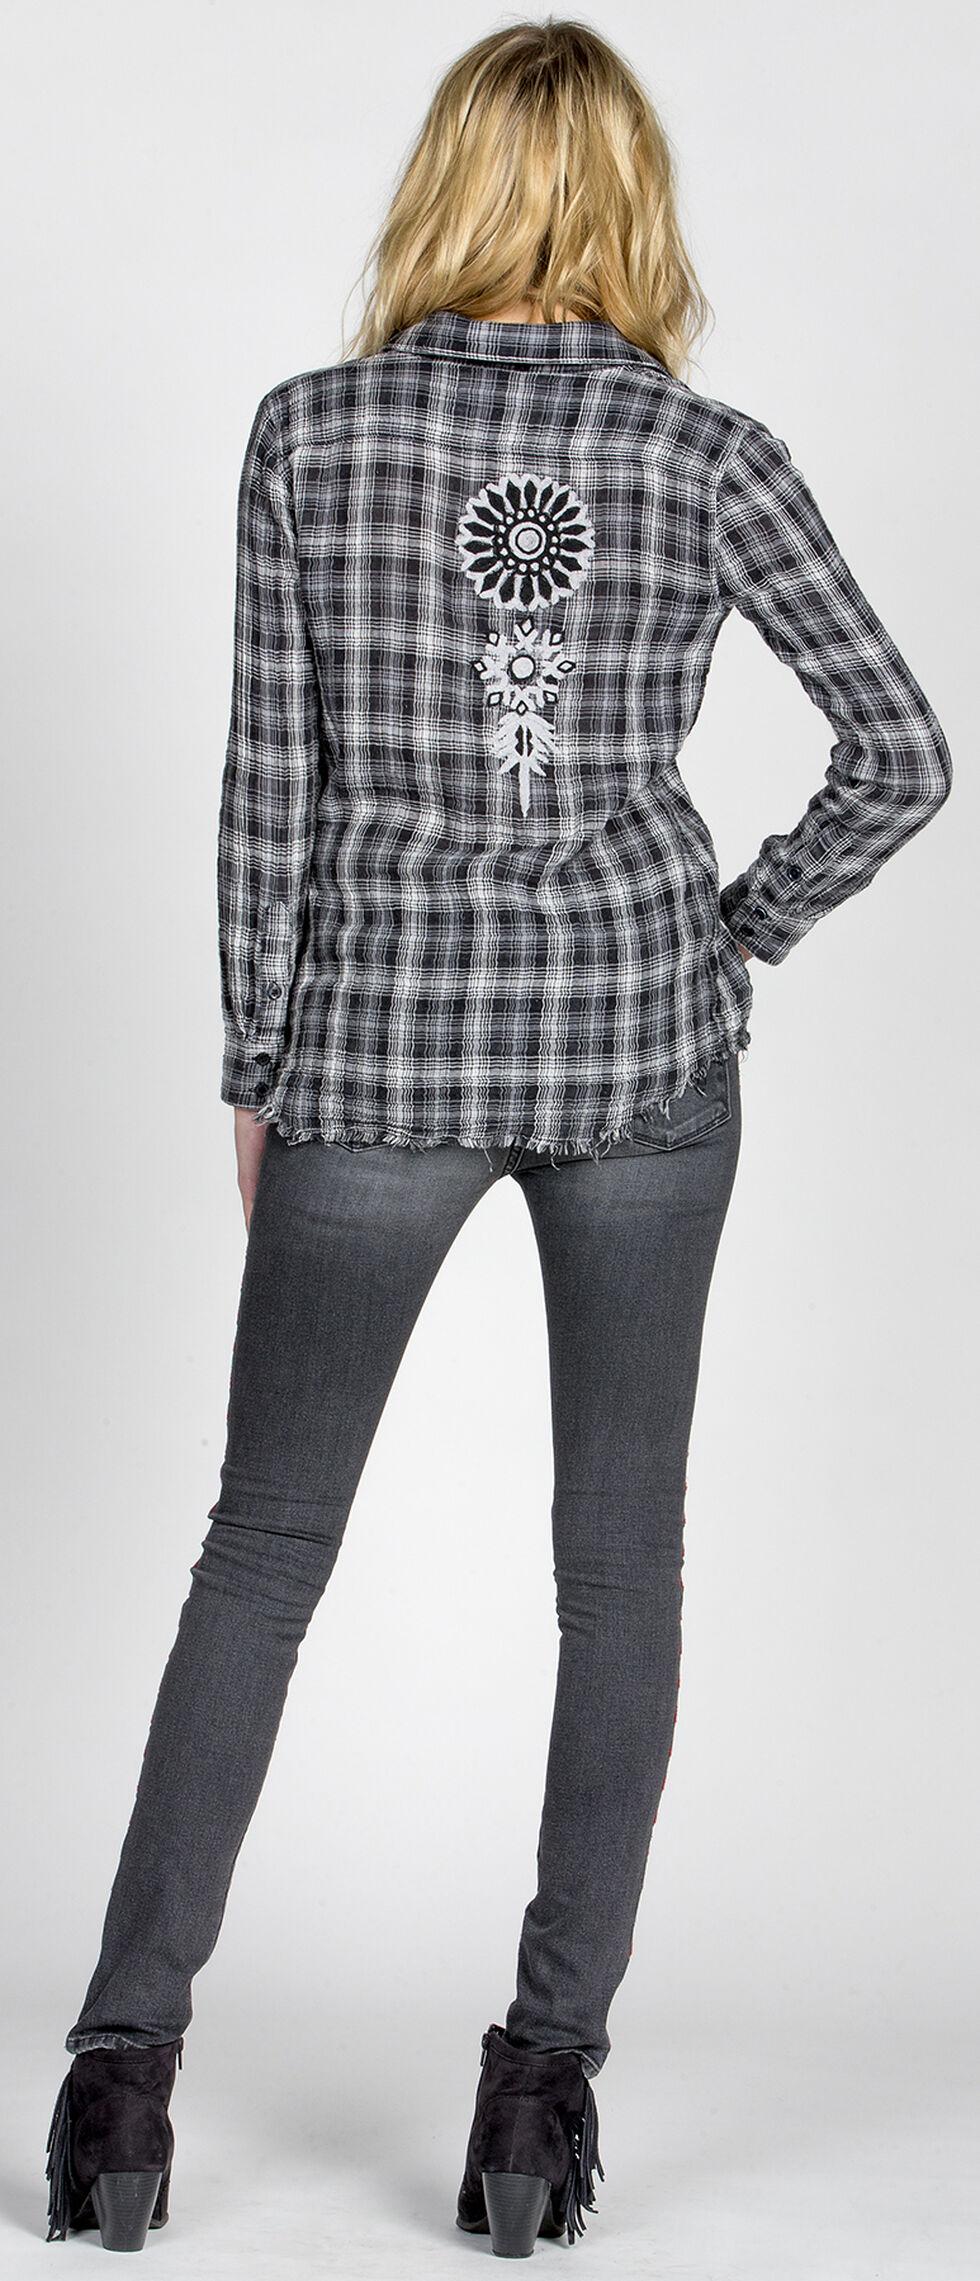 MM Vintage Women's Highway Rider Plaid Shirt, Grey, hi-res